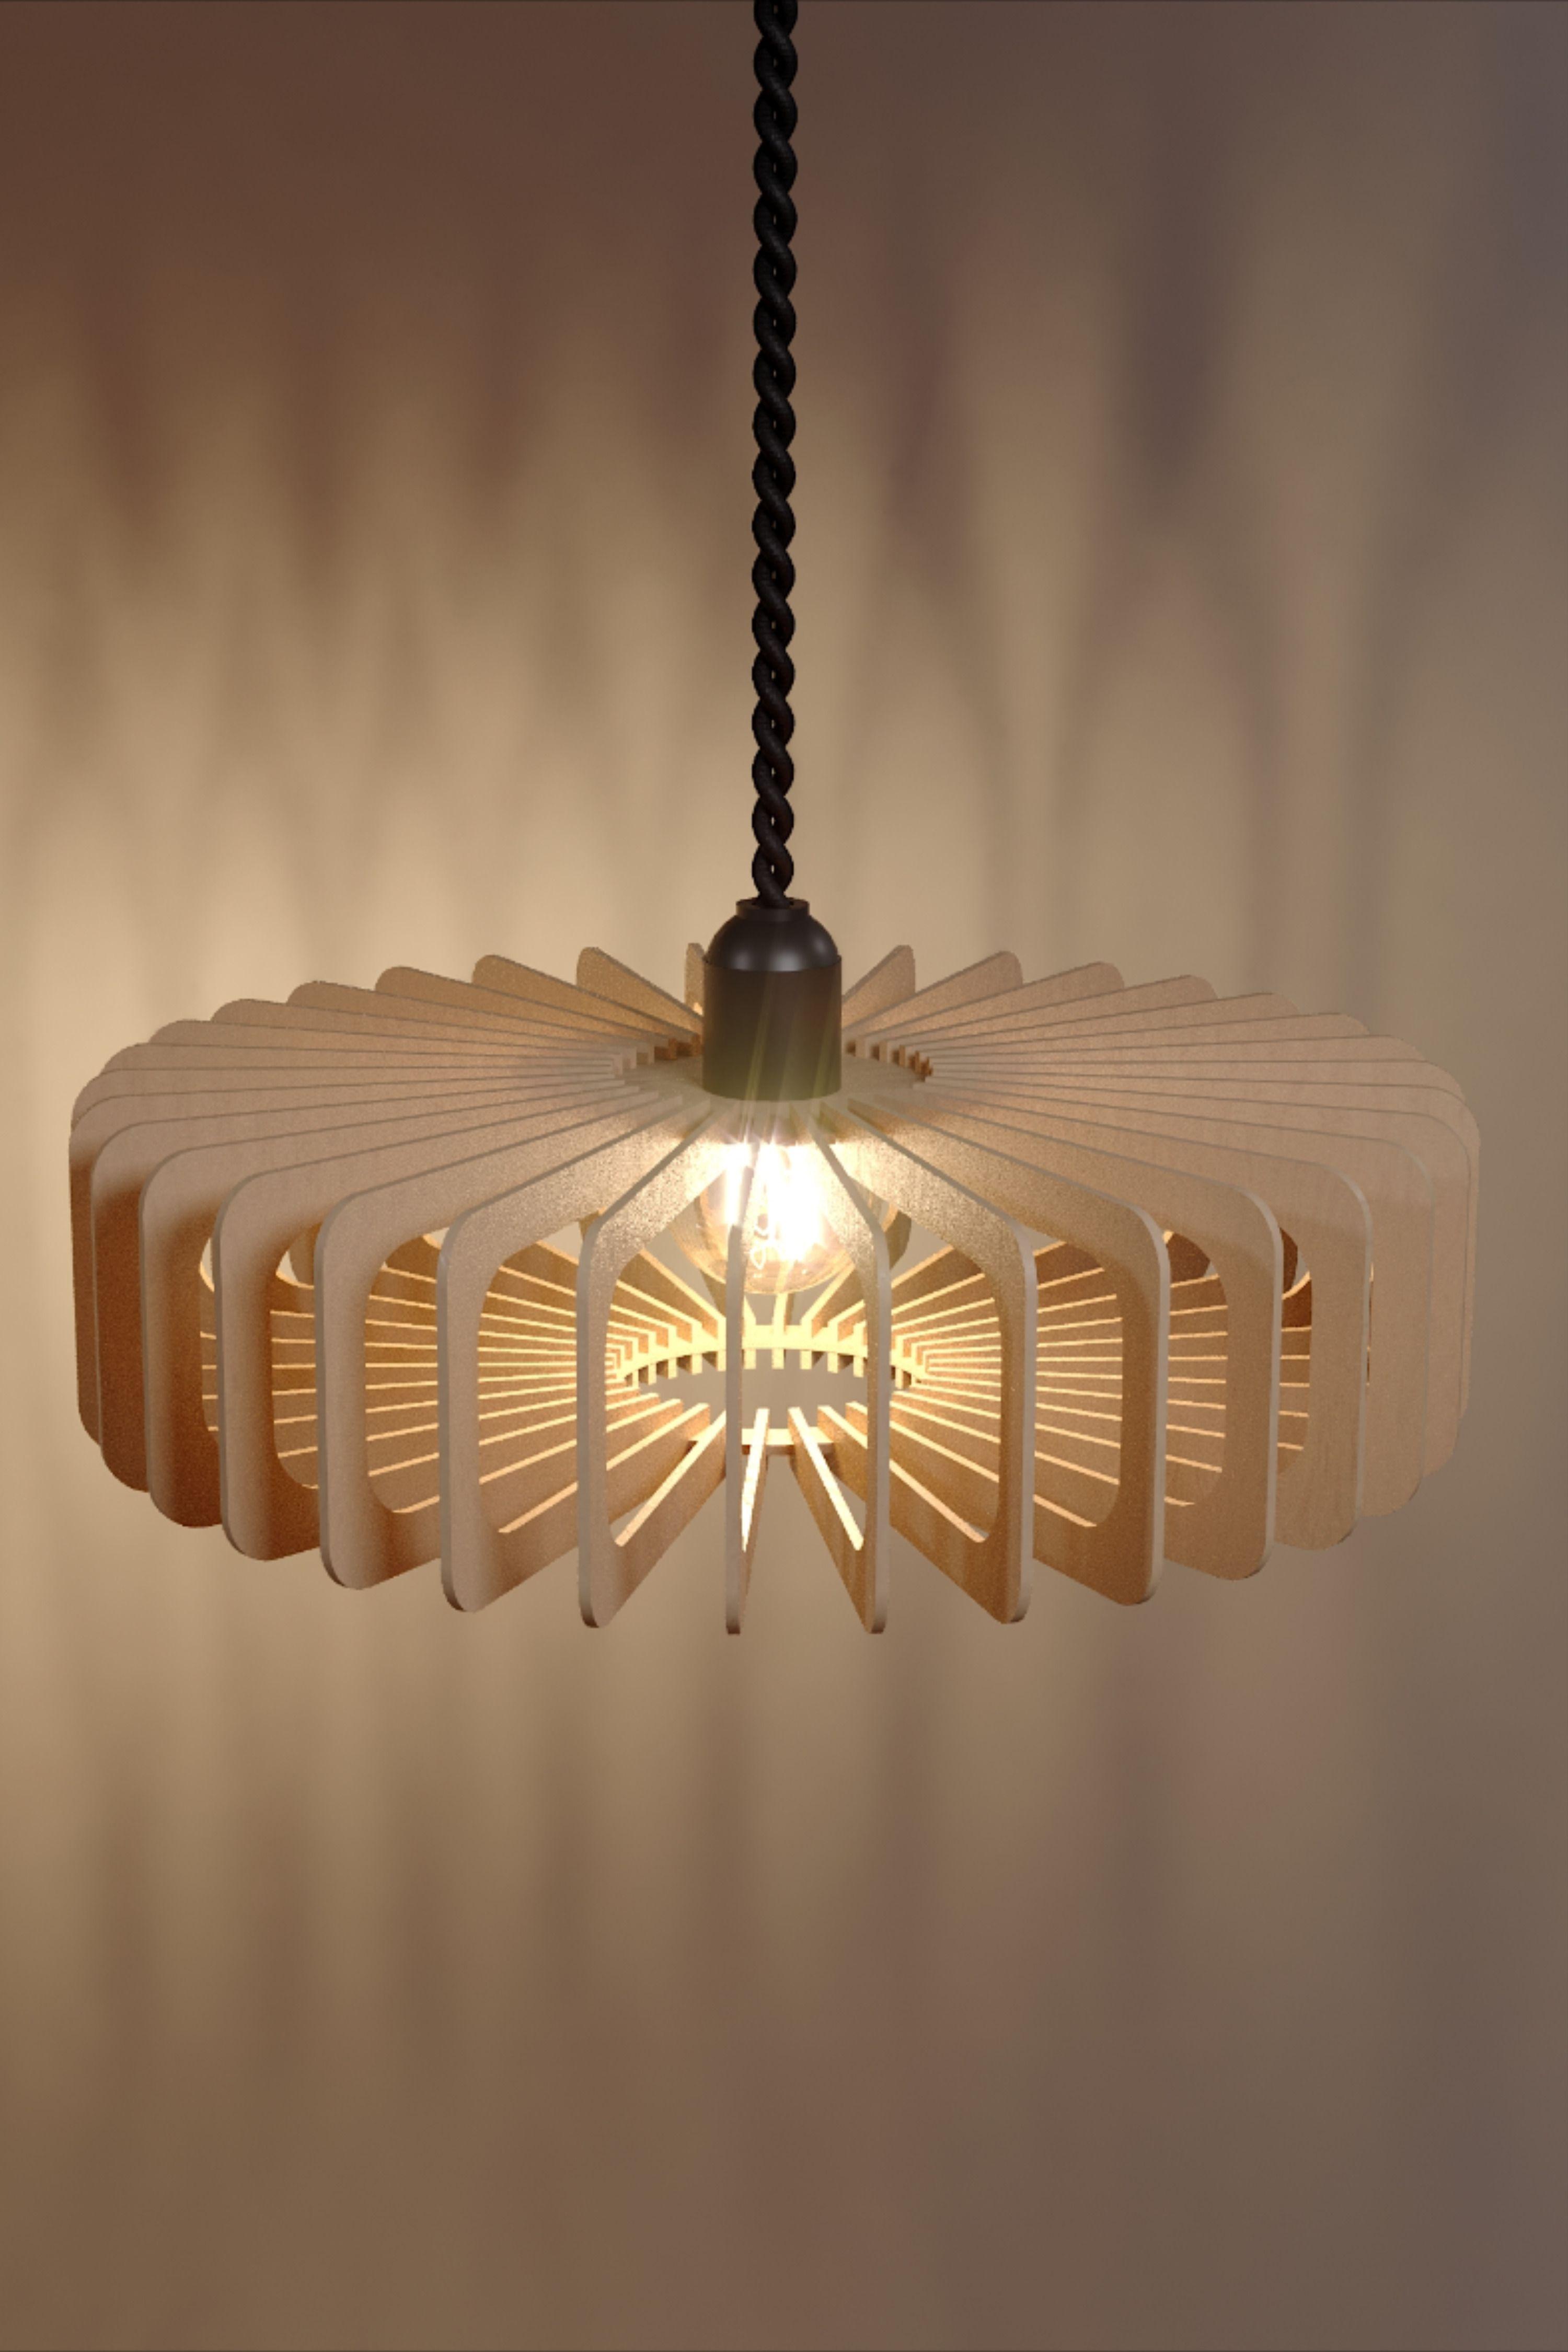 Geometric Wood Lamp Vasilek Shade Lamp Plywood Lamp Ceiling Etsy In 2020 Wood Lighting Design Wood Lamps Modern Lamp Shades